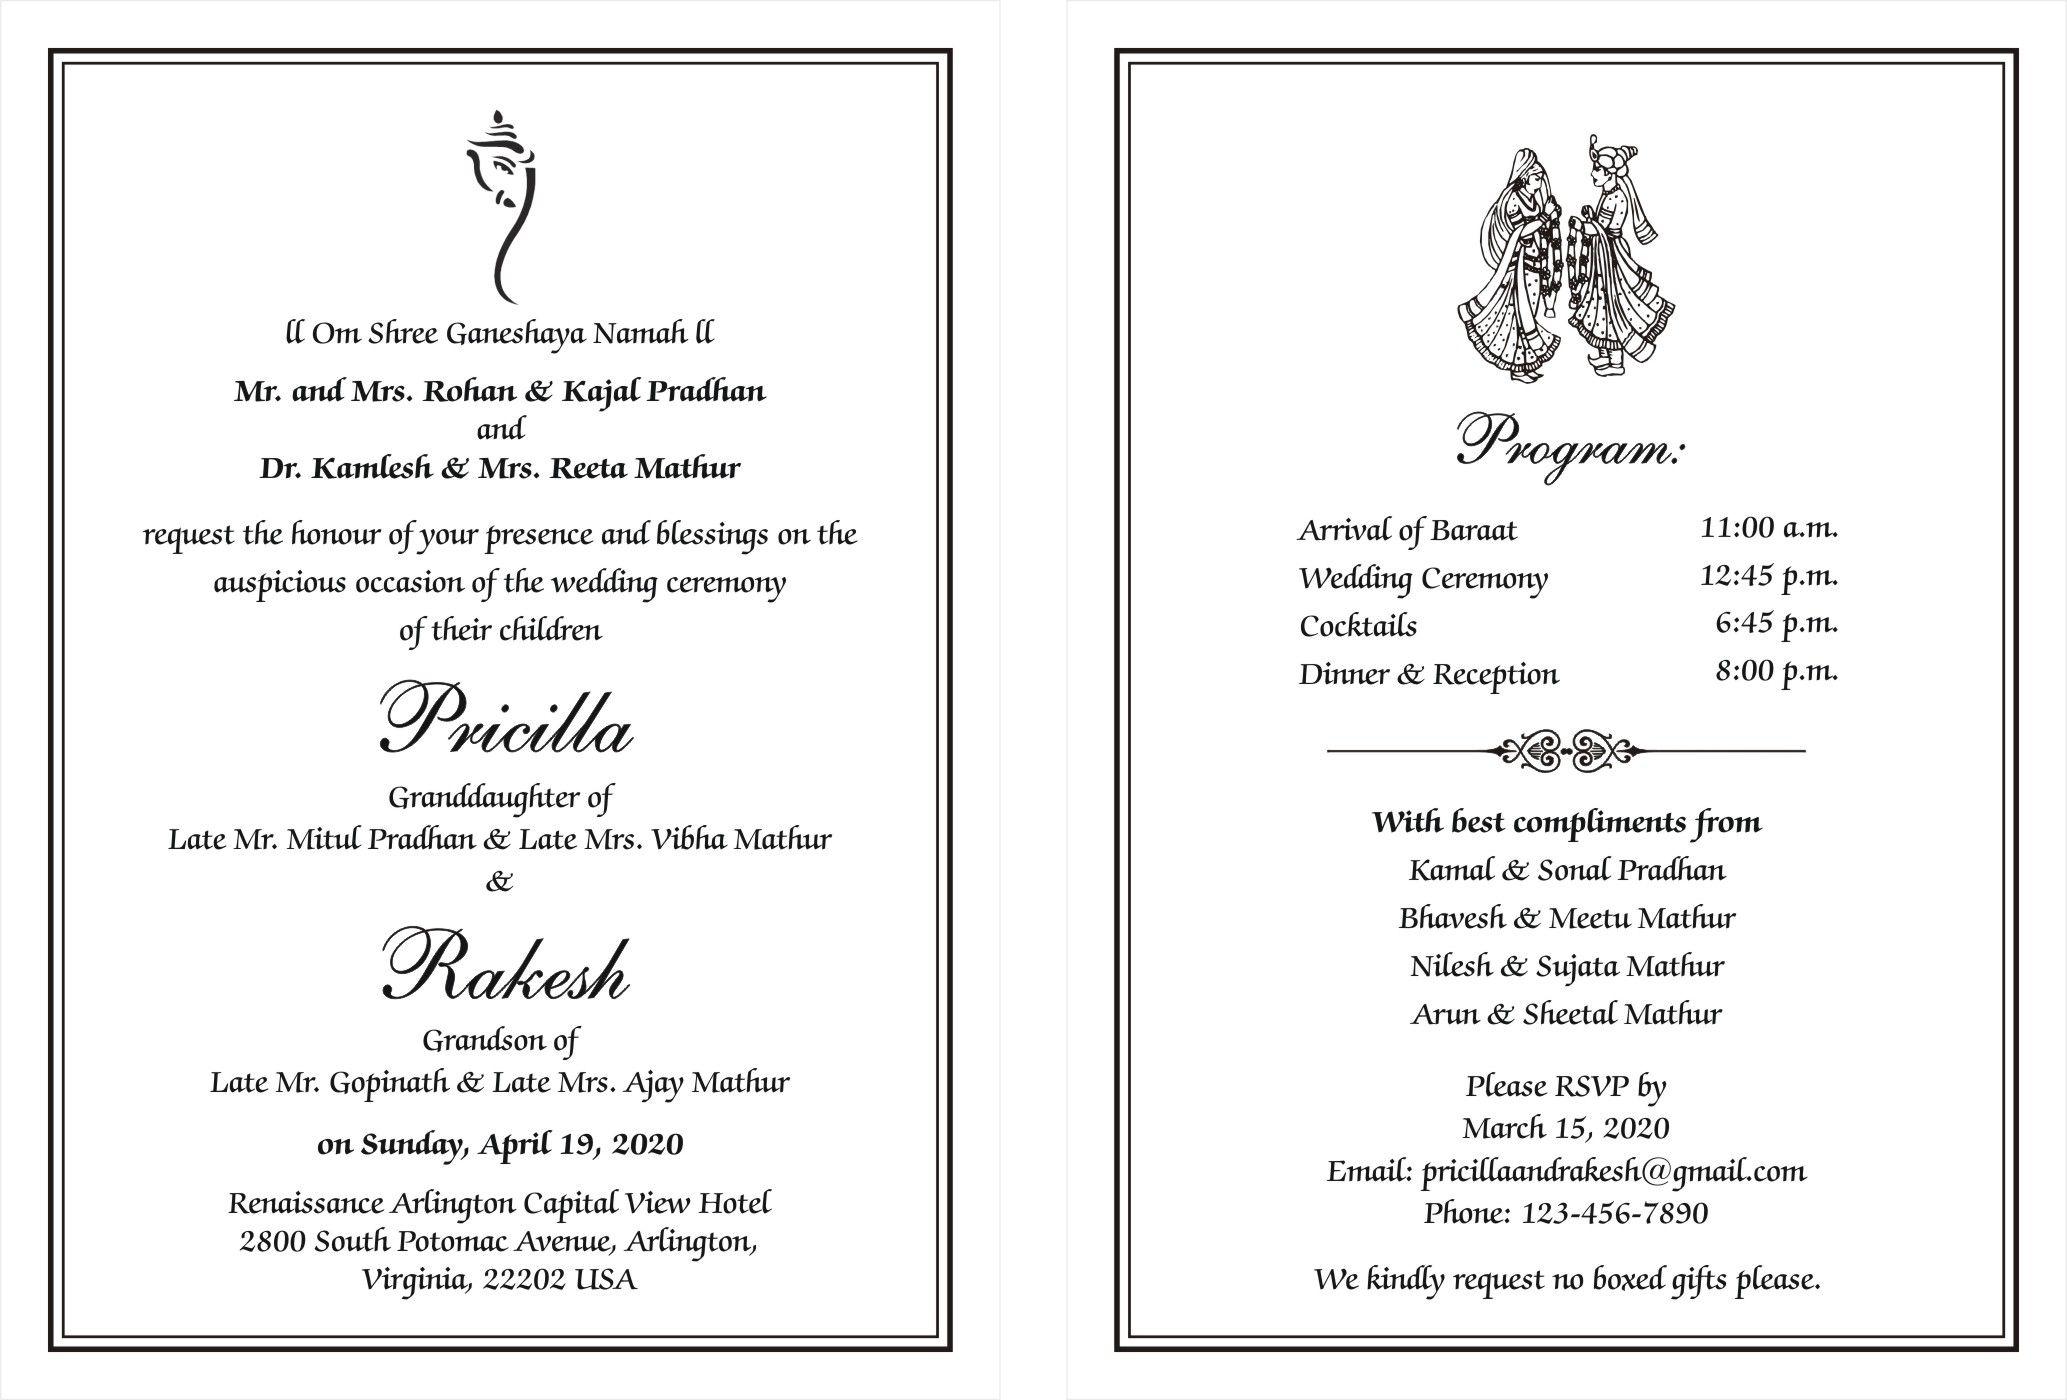 Hindu Wedding Cards Wordings (With images) Hindu wedding